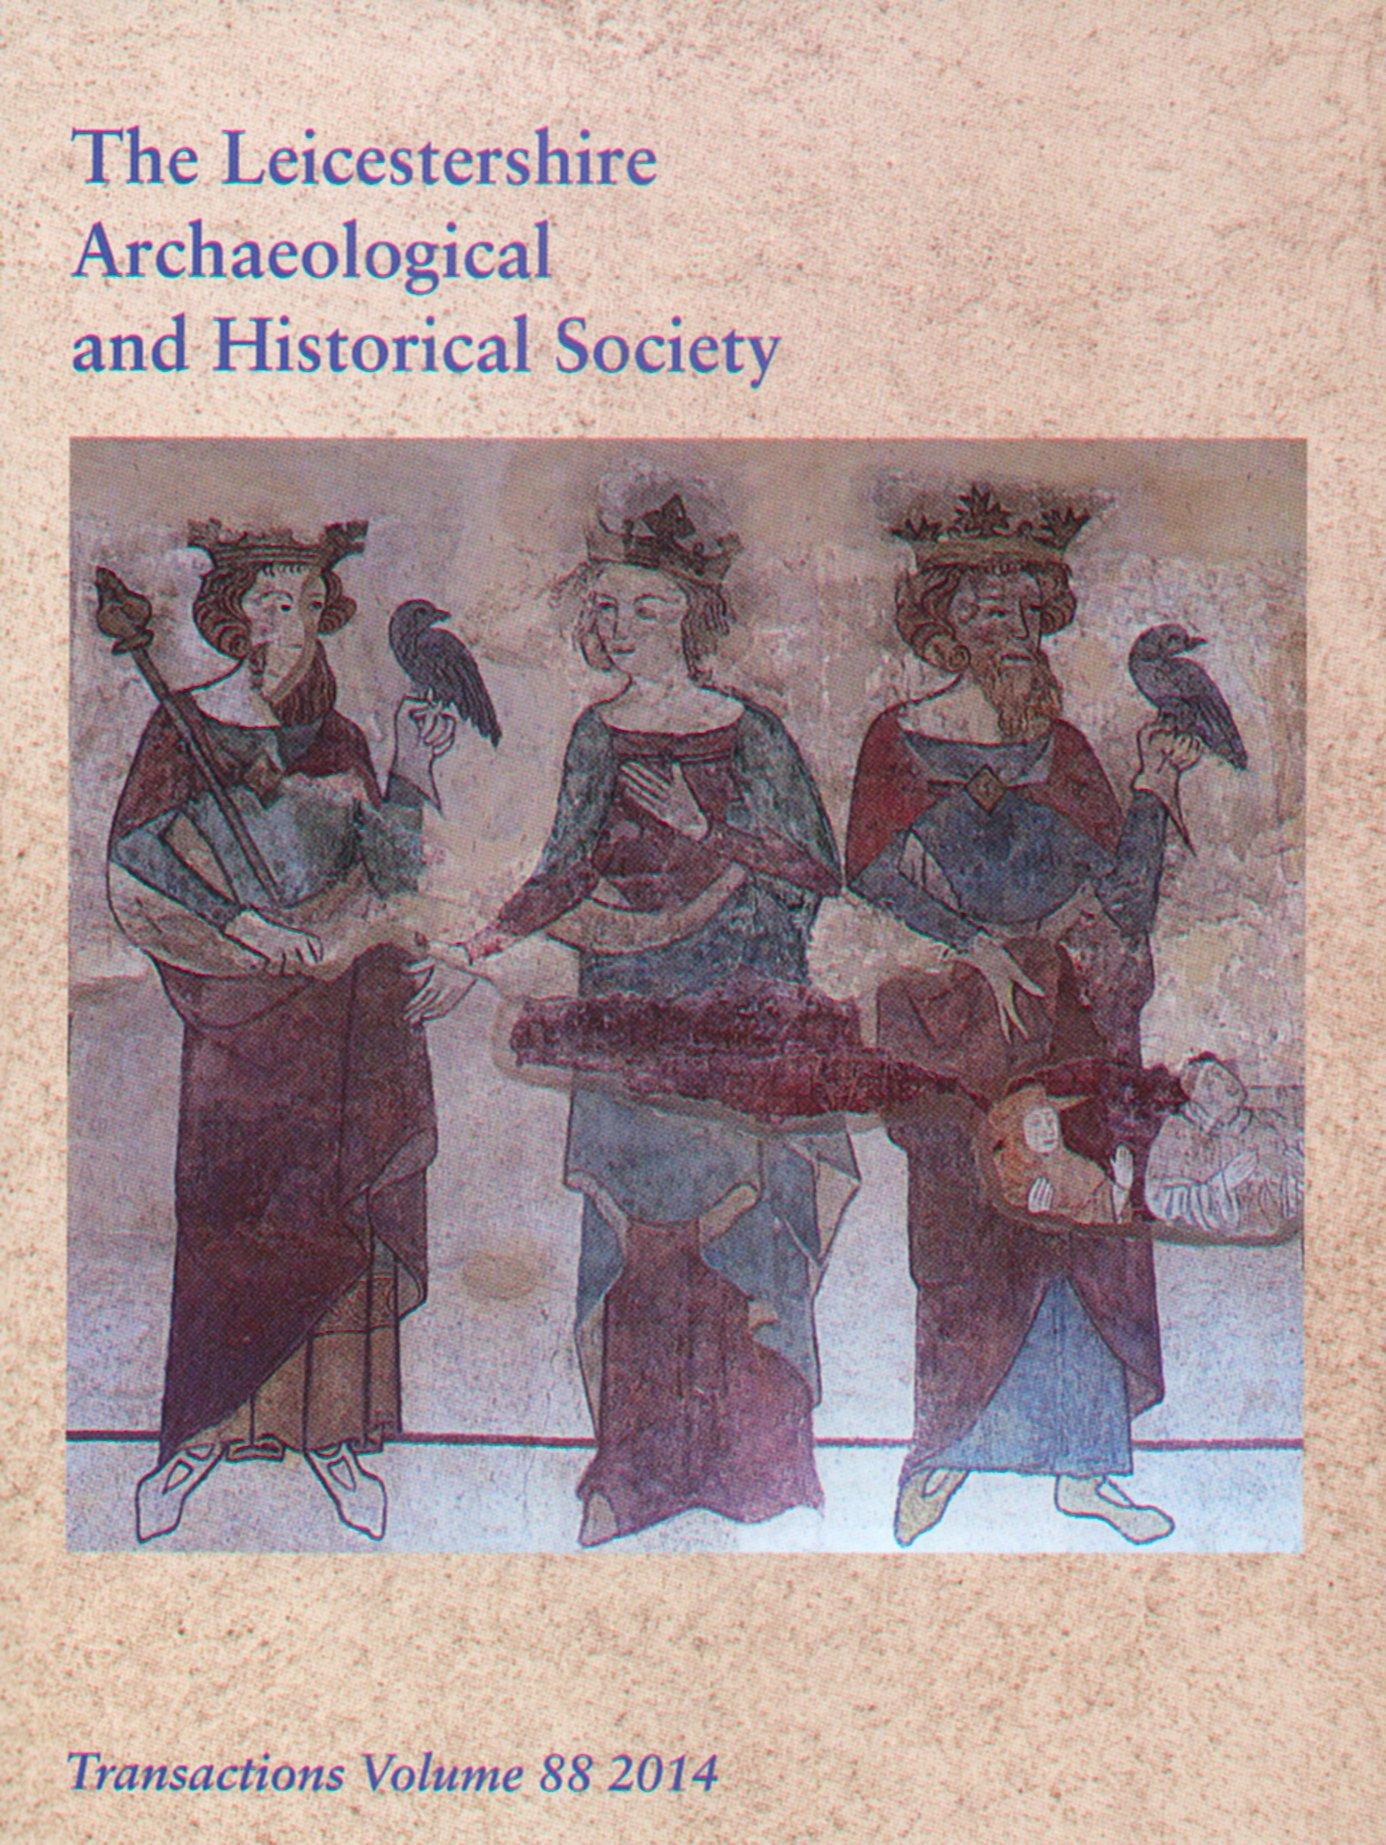 Latest volume of Transactions published